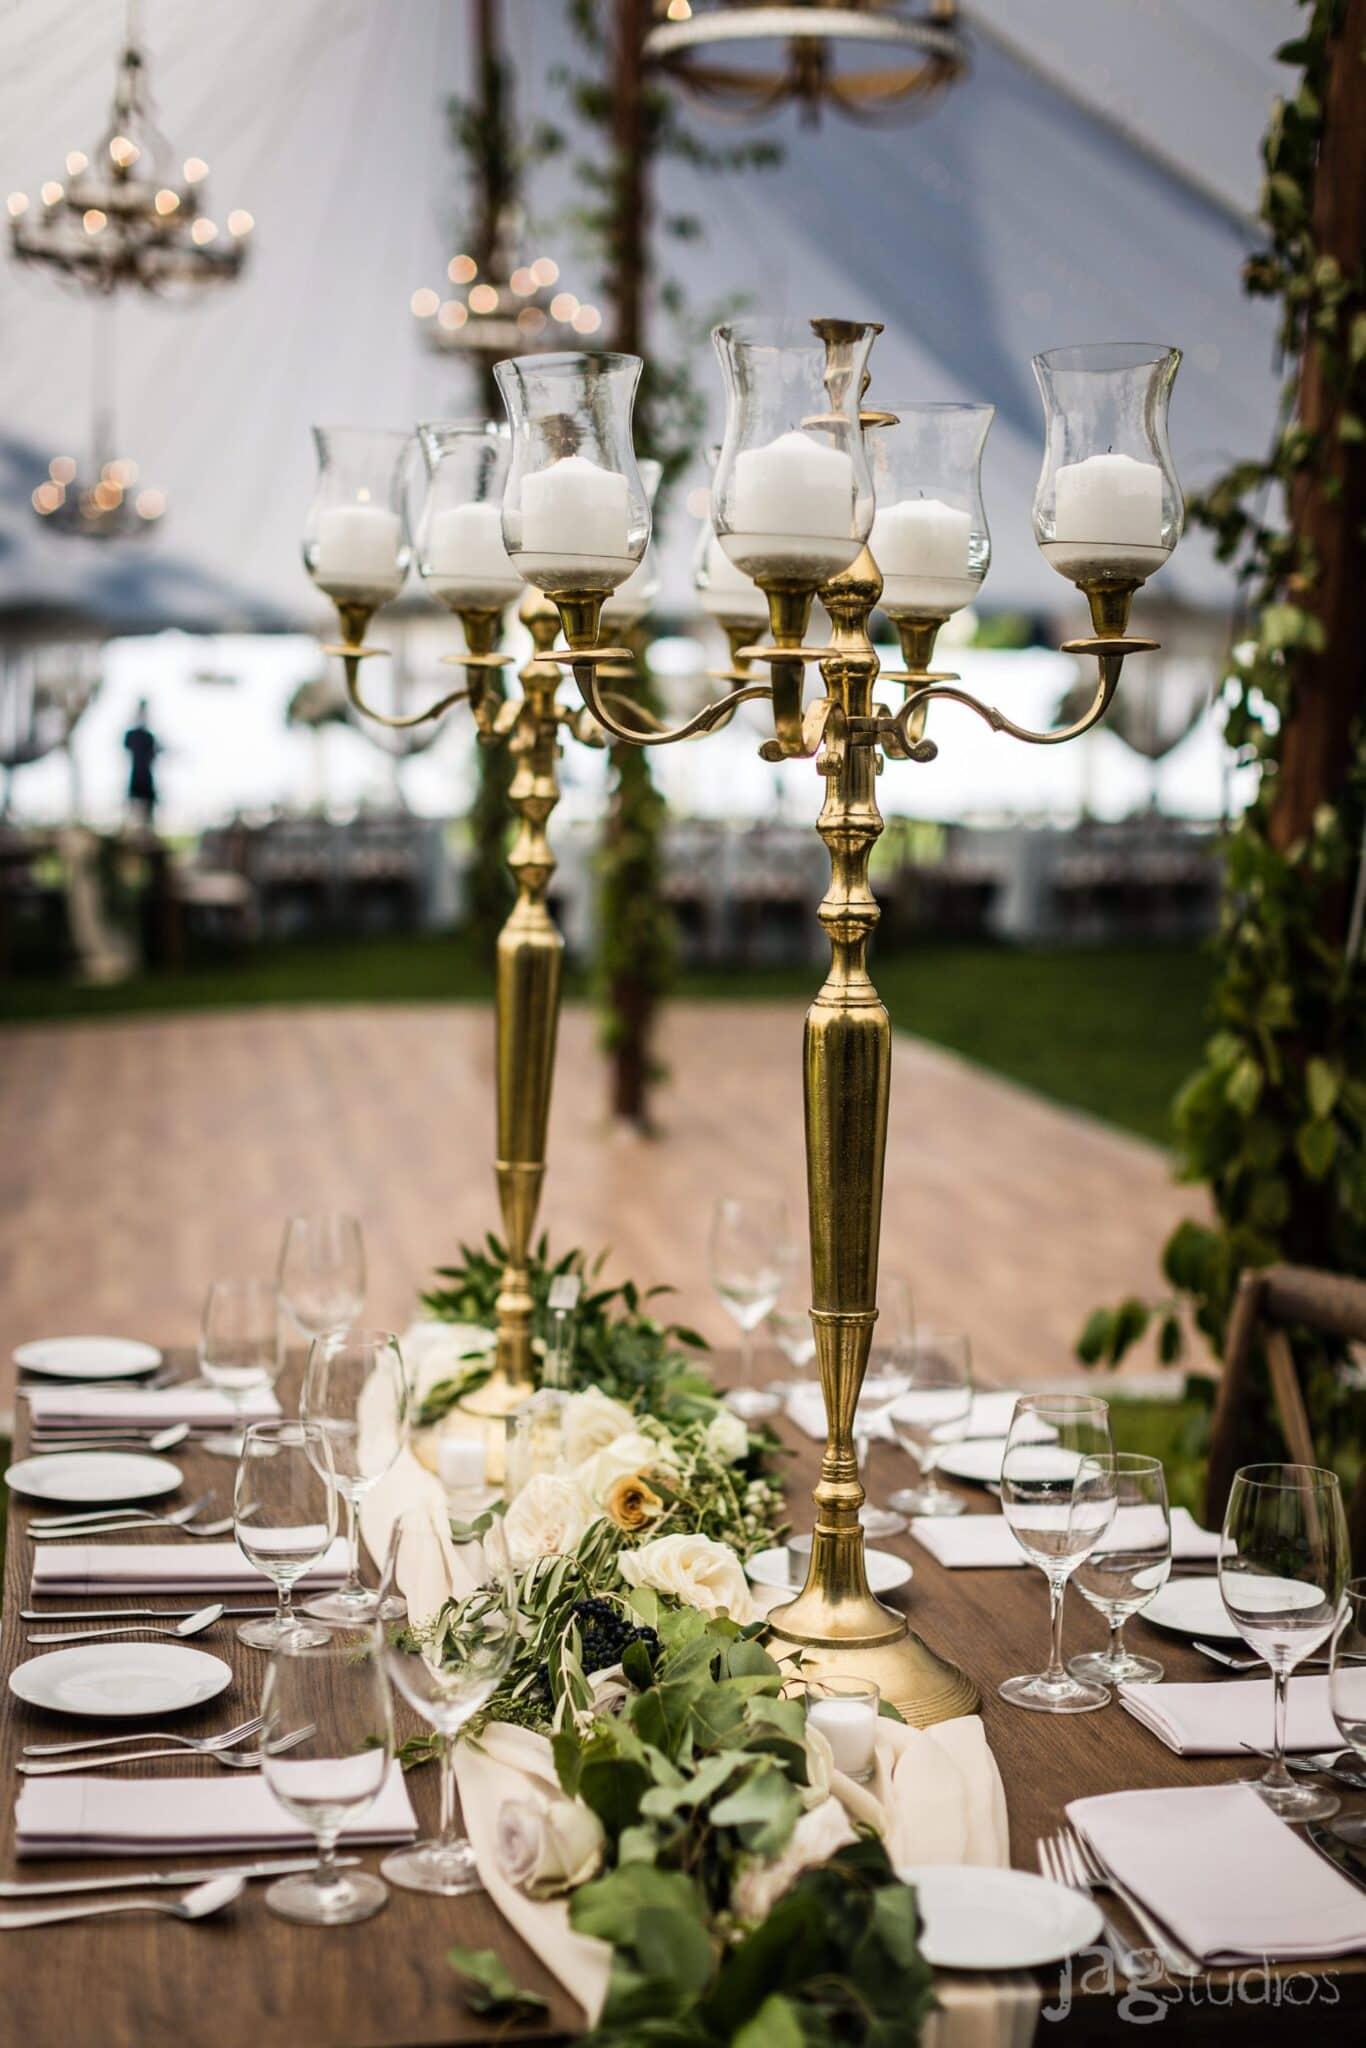 A Midnight Summer Dream gold chandeliers luxury New England Wedding Jaclyn Watson Events